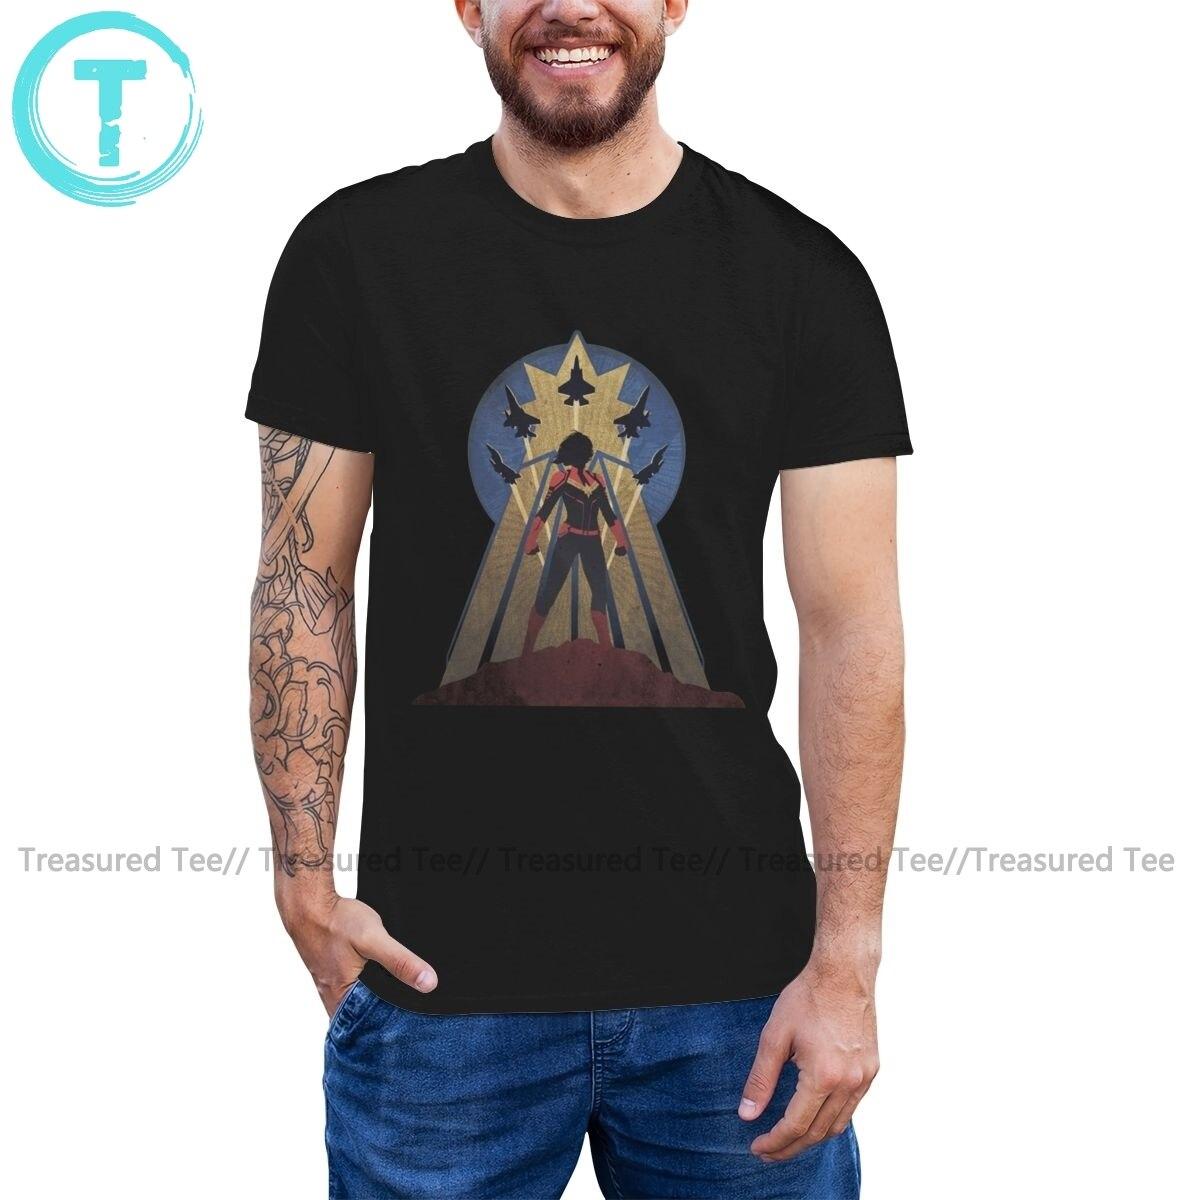 Camiseta de capitán Marvel, camiseta de capitán Art Deco Airforce, camiseta para hombre de 6XL, camiseta estampada impresionante, camiseta 100 de algodón